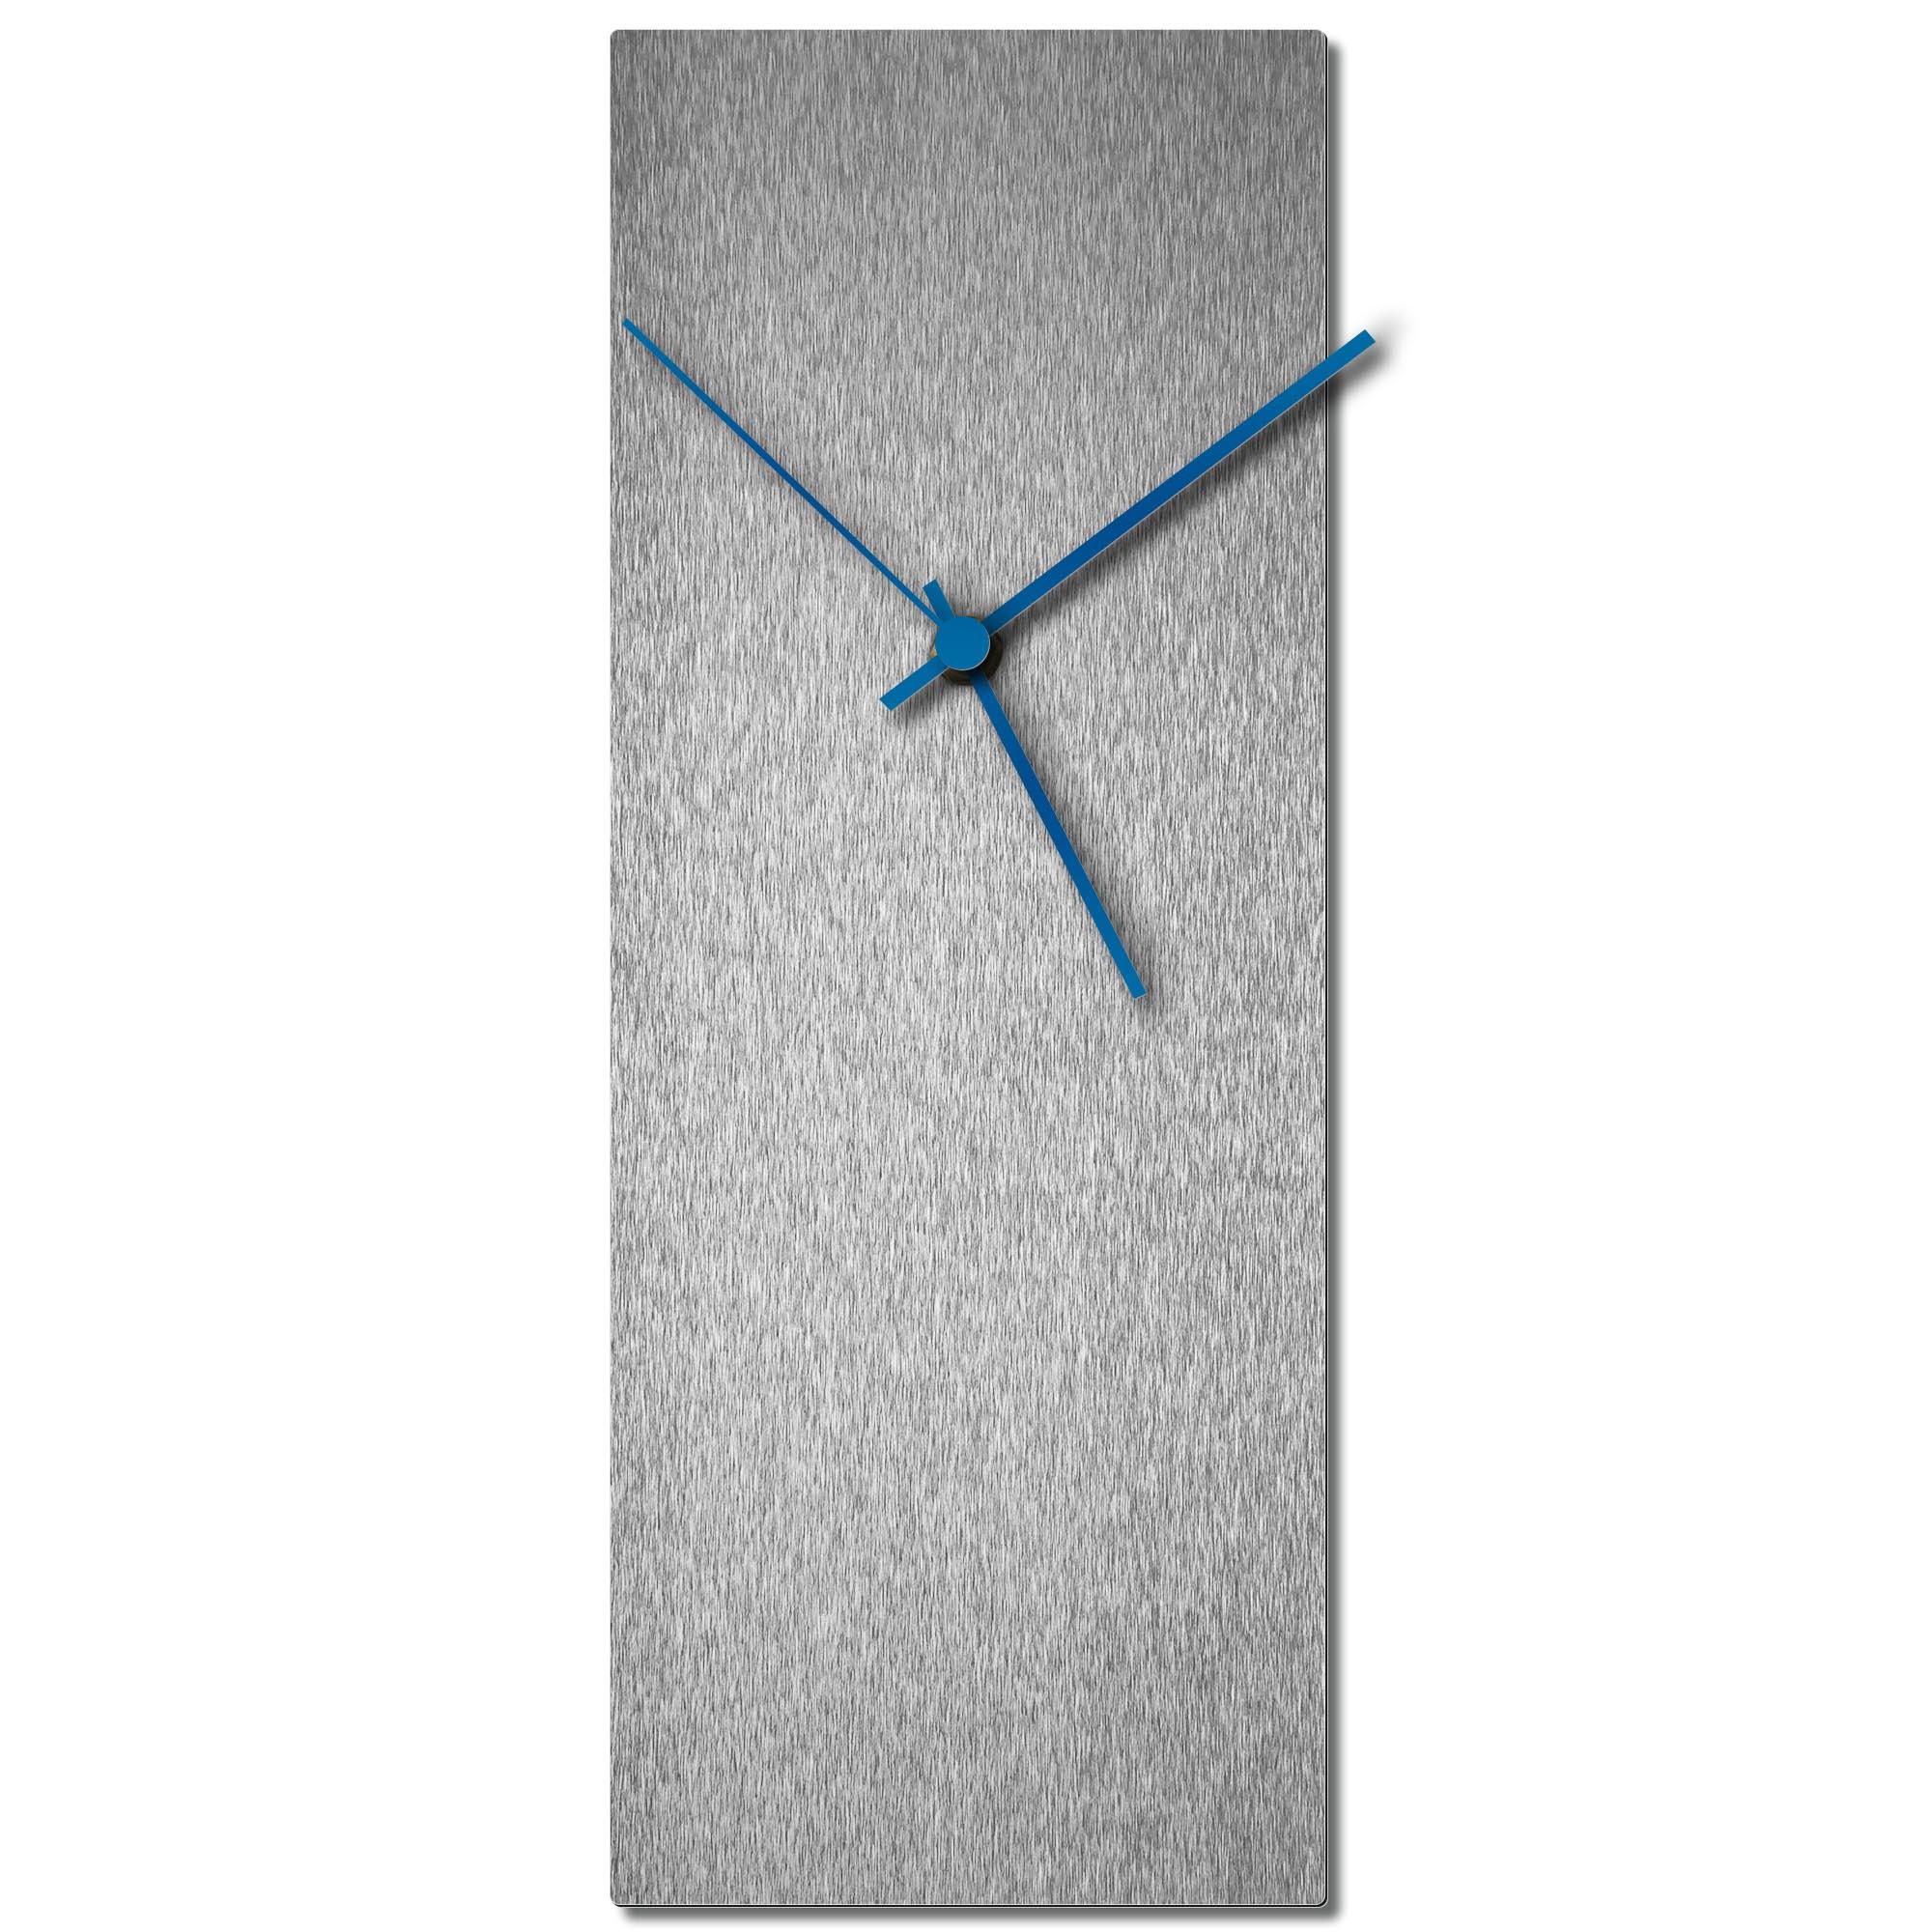 Adam Schwoeppe 'Silversmith Clock Blue' Midcentury Modern Style Wall Clock